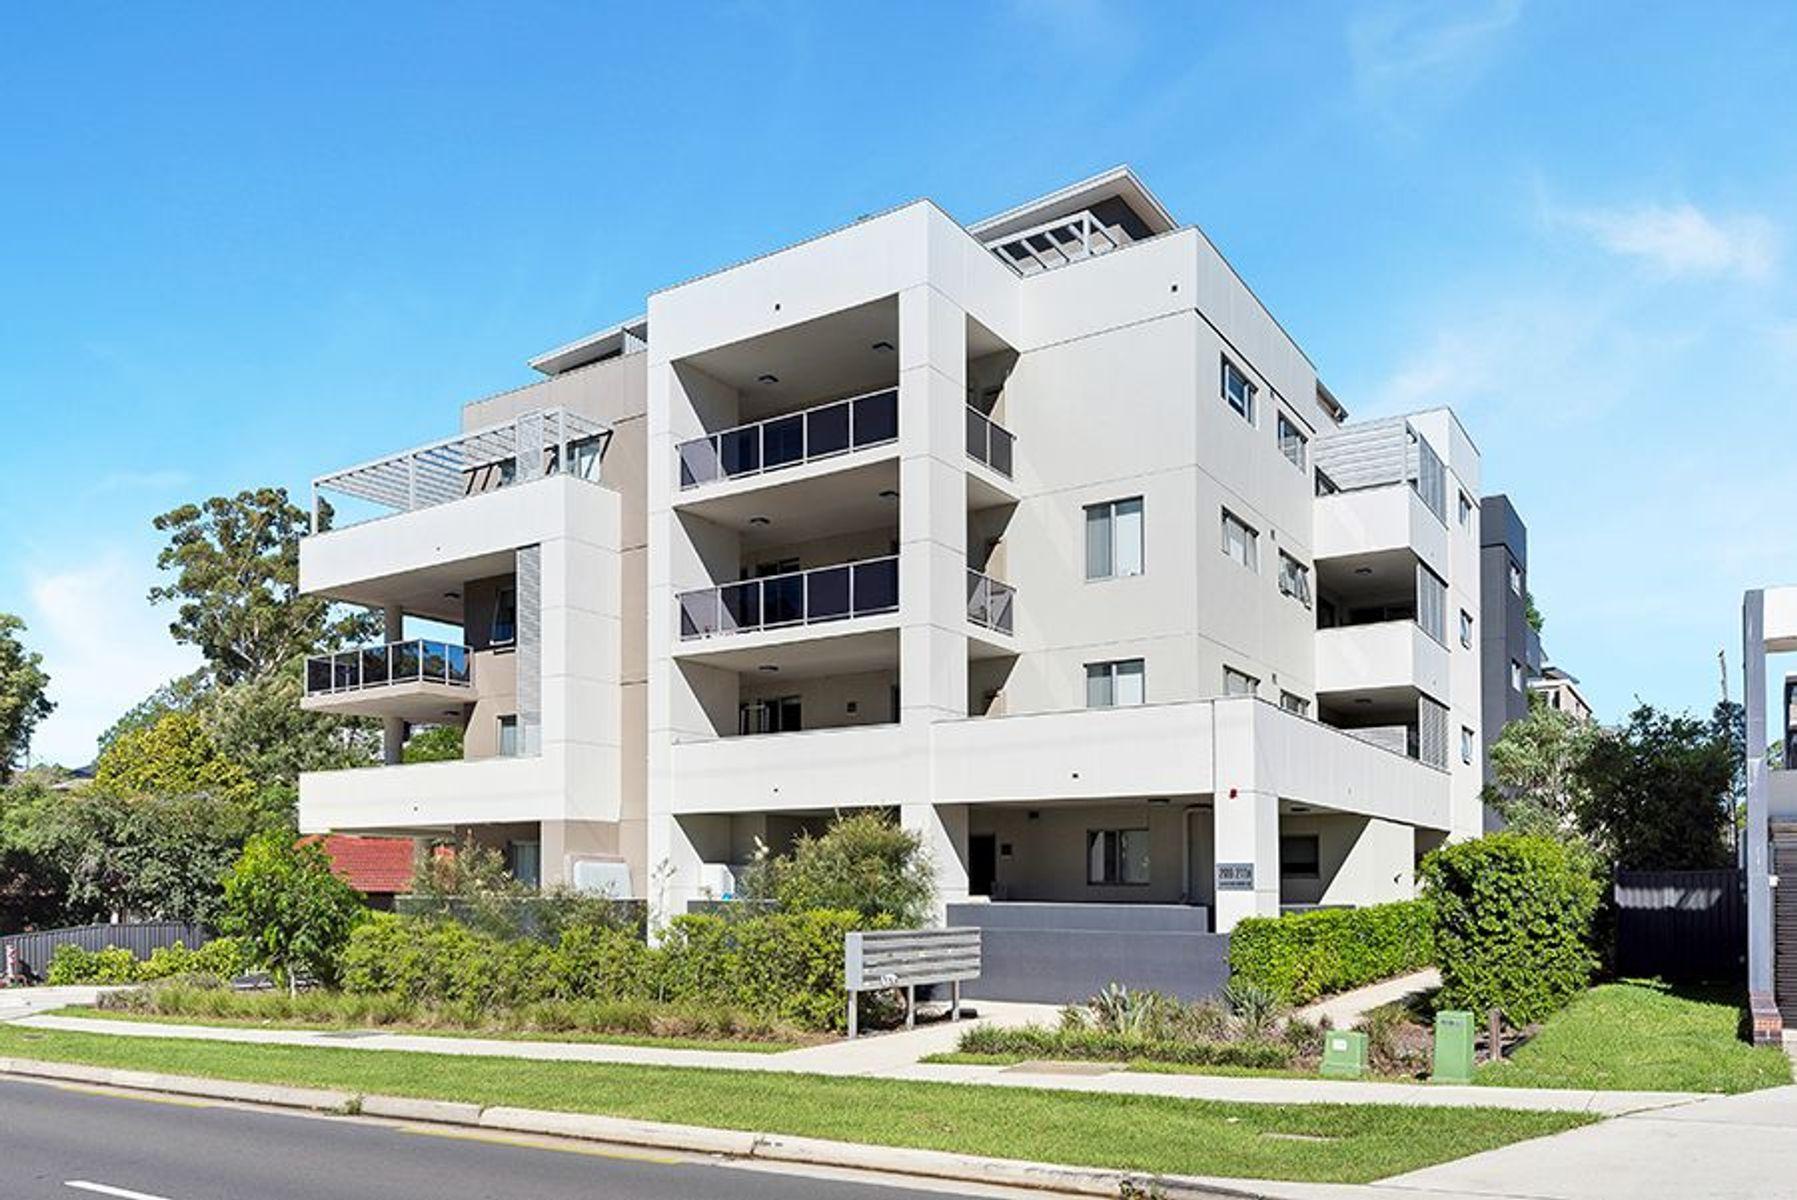 32/209-211A Carlingford Road, Carlingford, NSW 2118